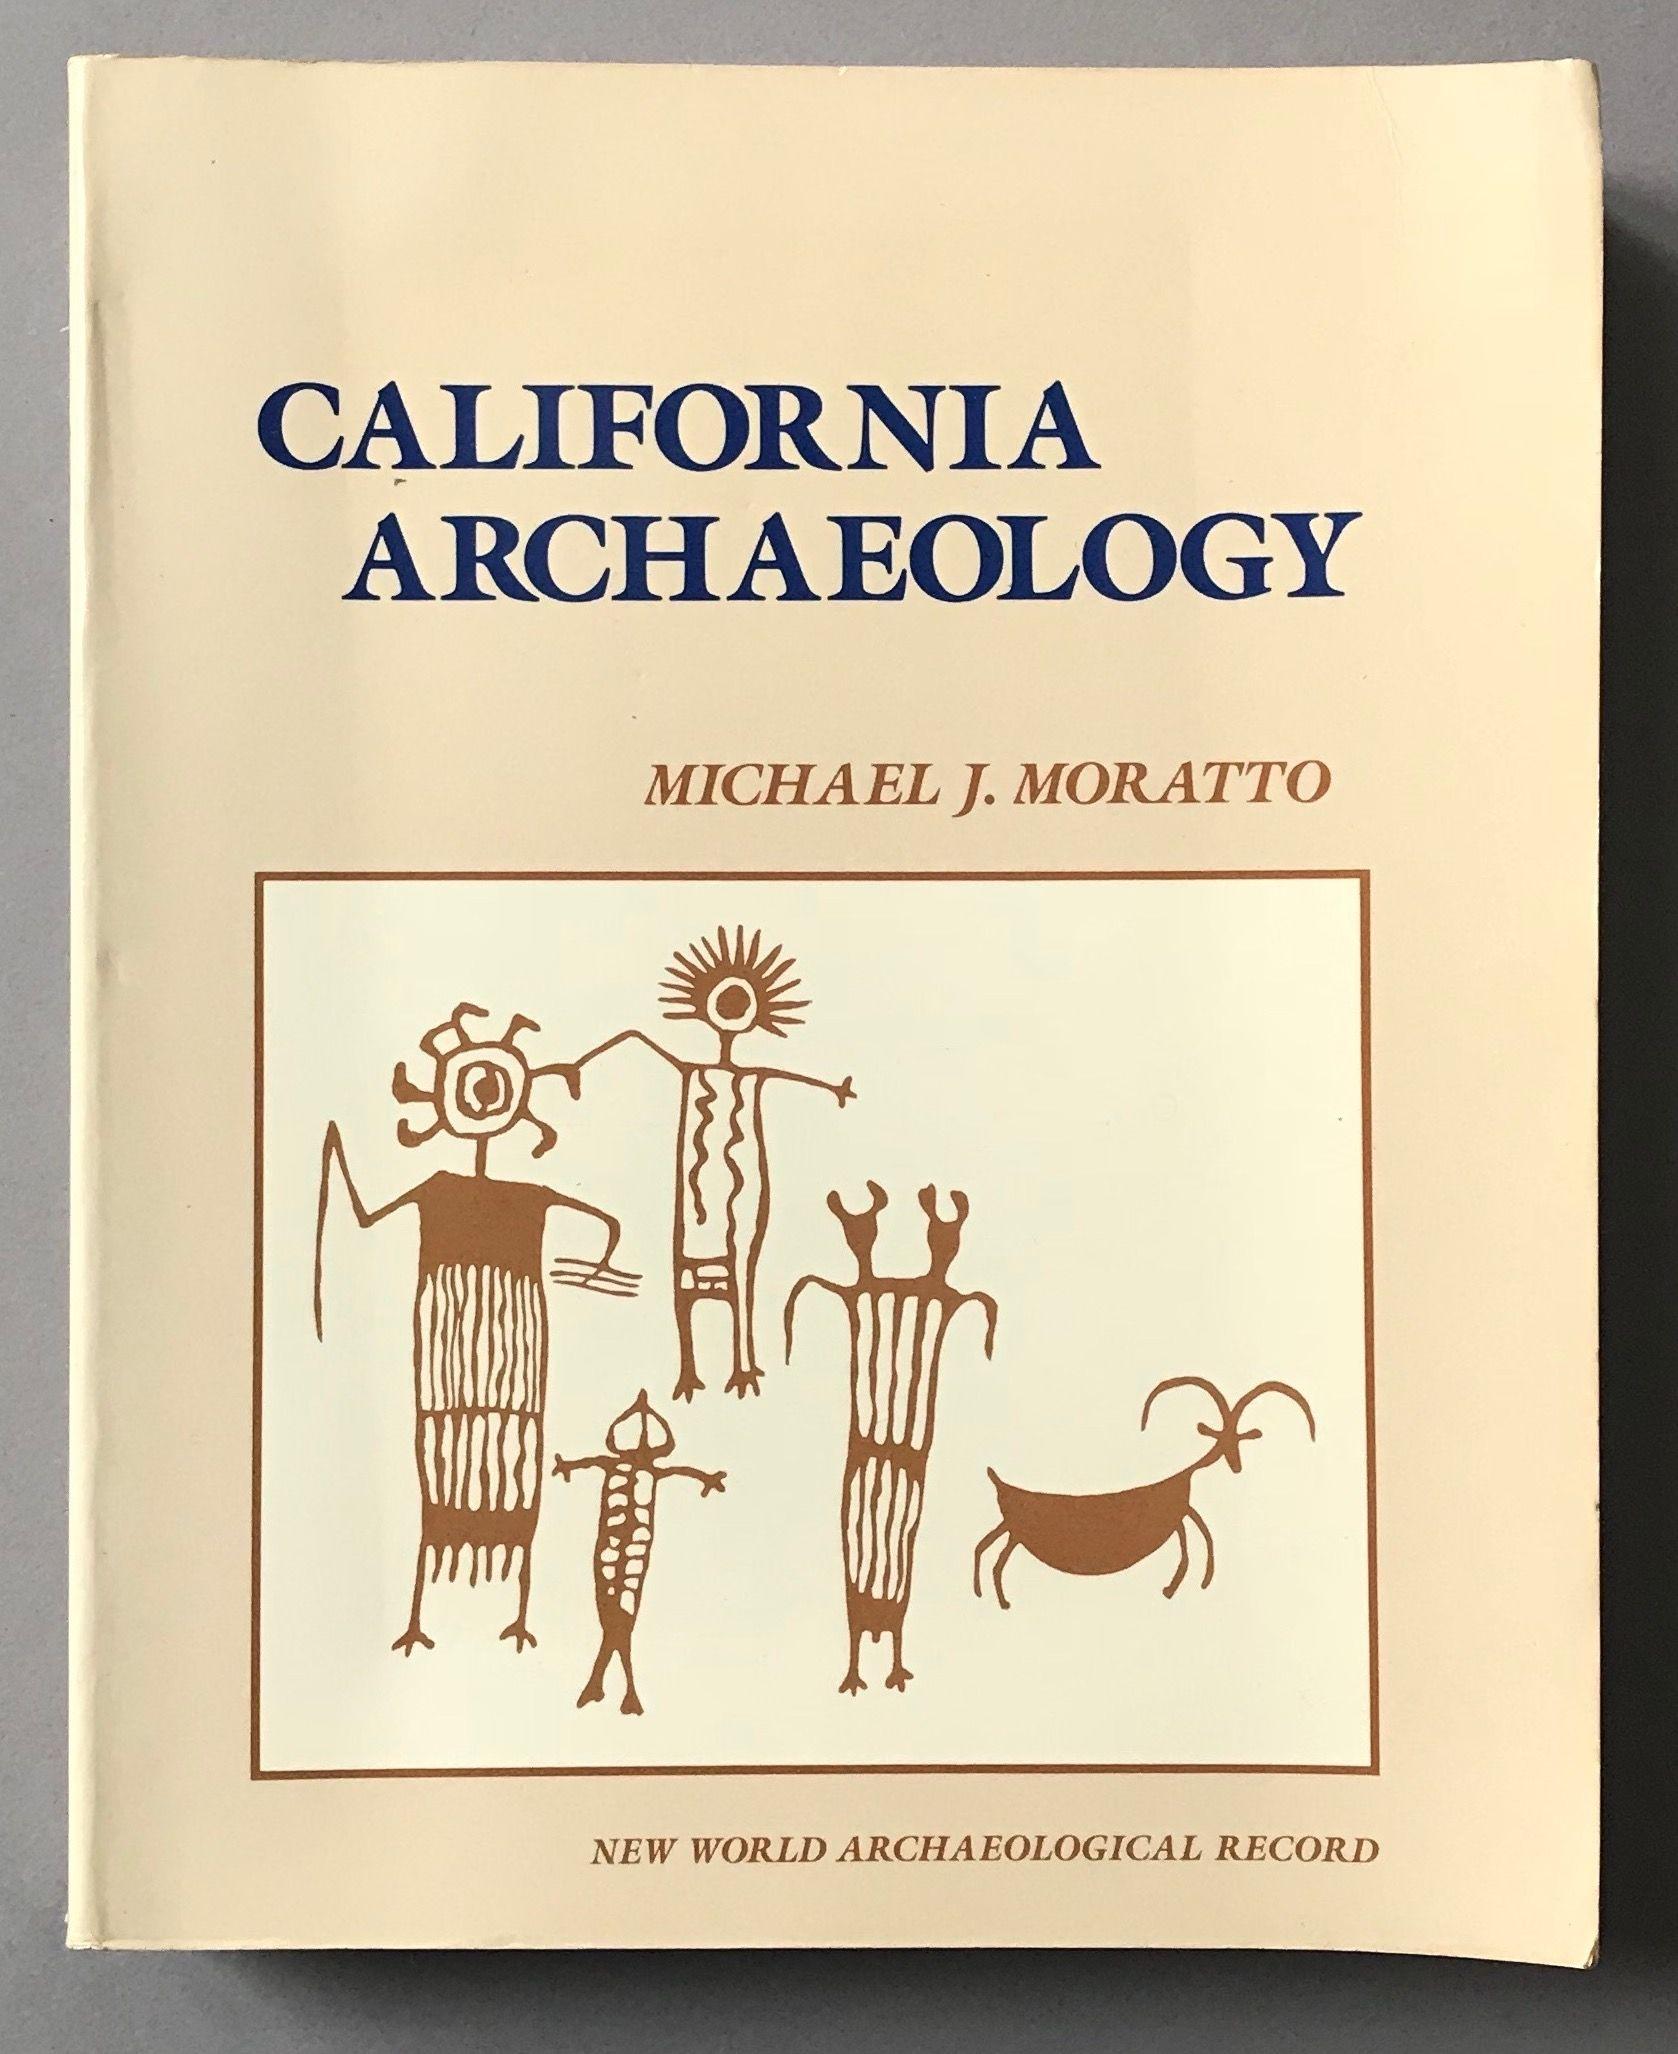 9780125061827 - California Archaeology (New world